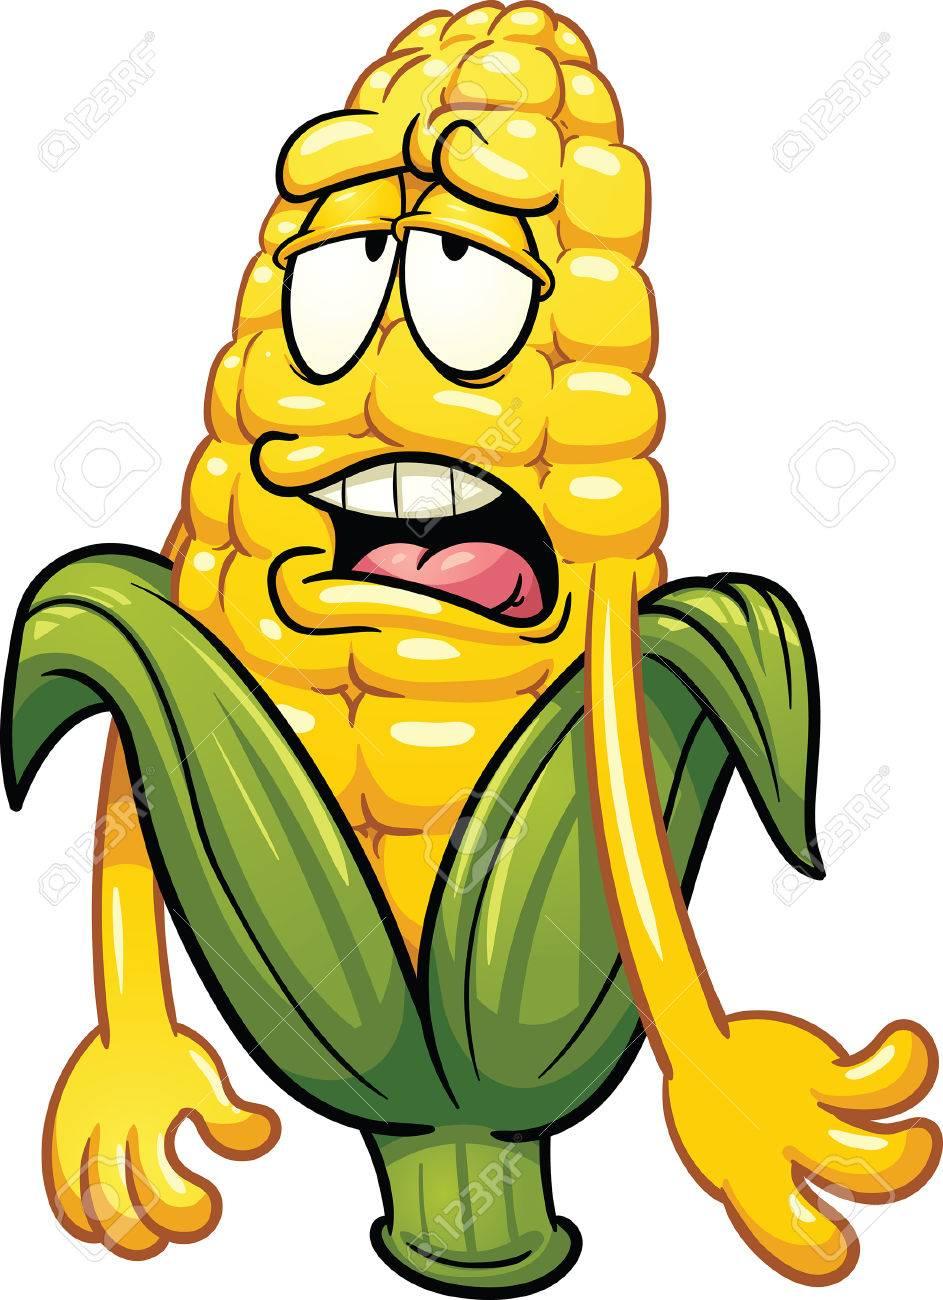 943x1300 Bored Cartoon Corn. Vector Clip Art Illustration With Simple